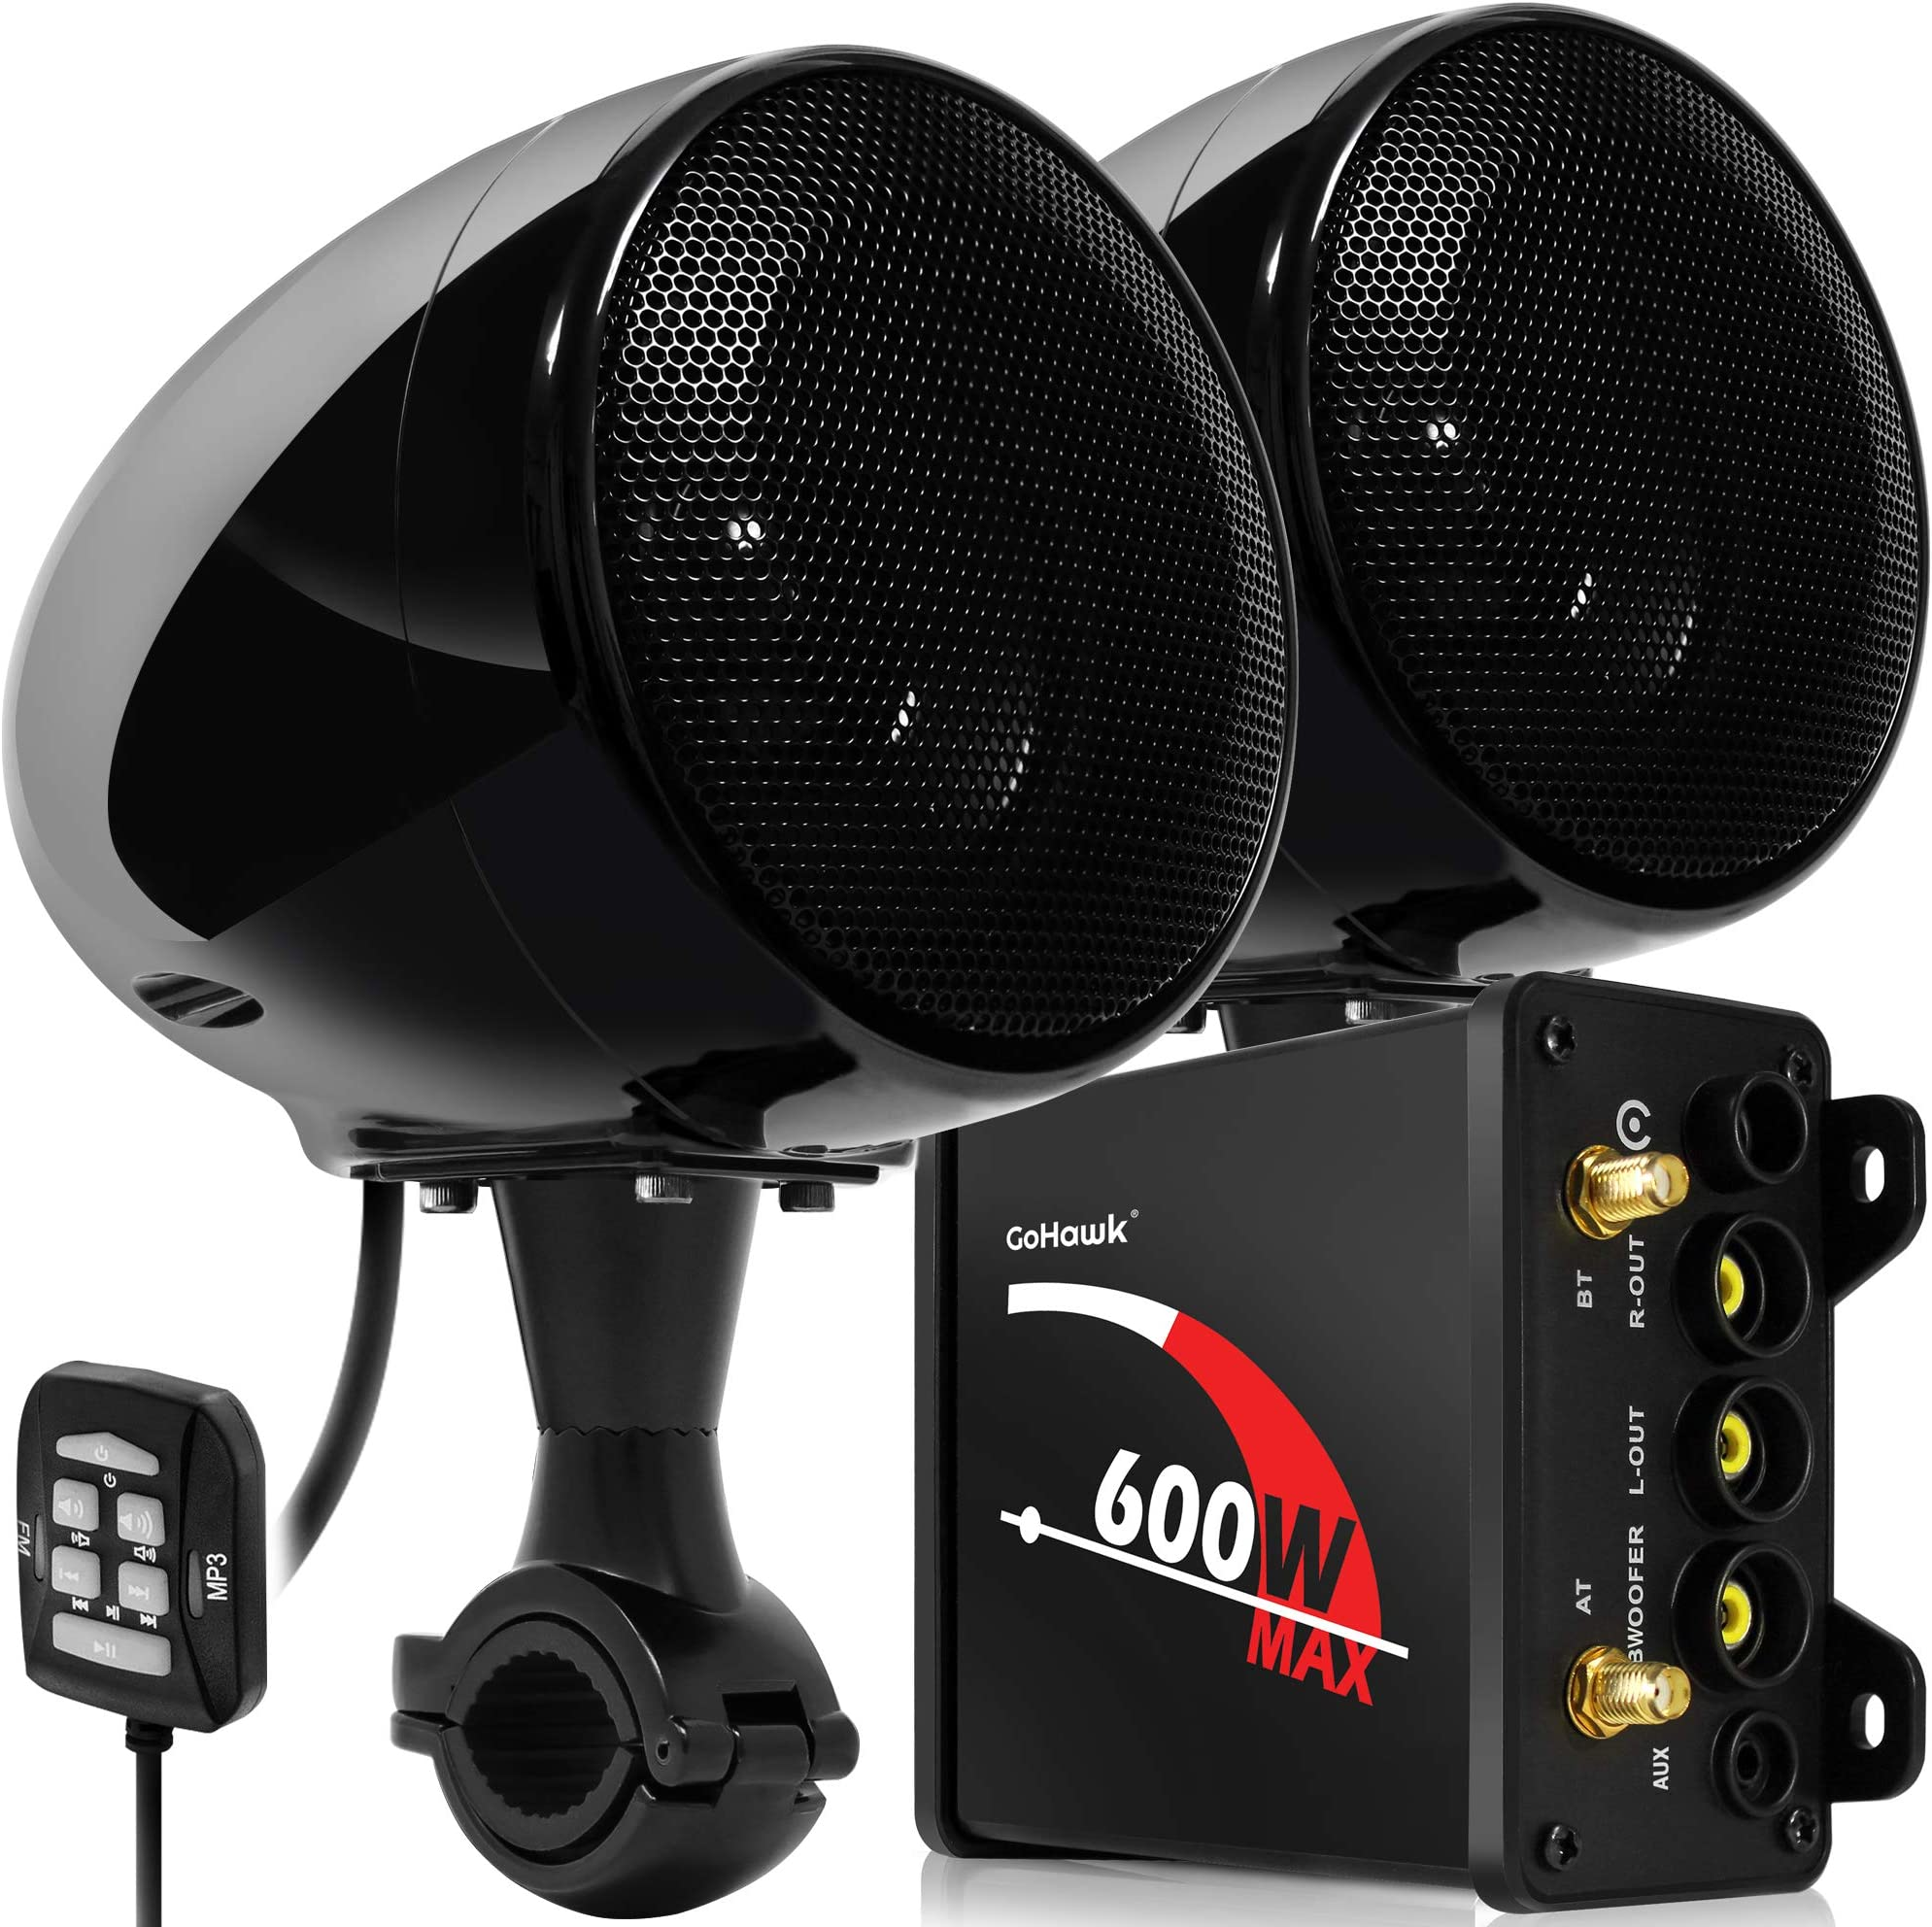 "GoHawk TN4 2.1 Channel Amplifier 4"" Full Range Waterproof Bluetooth Motorcycle Stereo Speakers Audio System AUX FM Radio for 1 to 1.25 in. Handlebar Harley Yamaha Can-Am ATV UTV RZR Polaris"